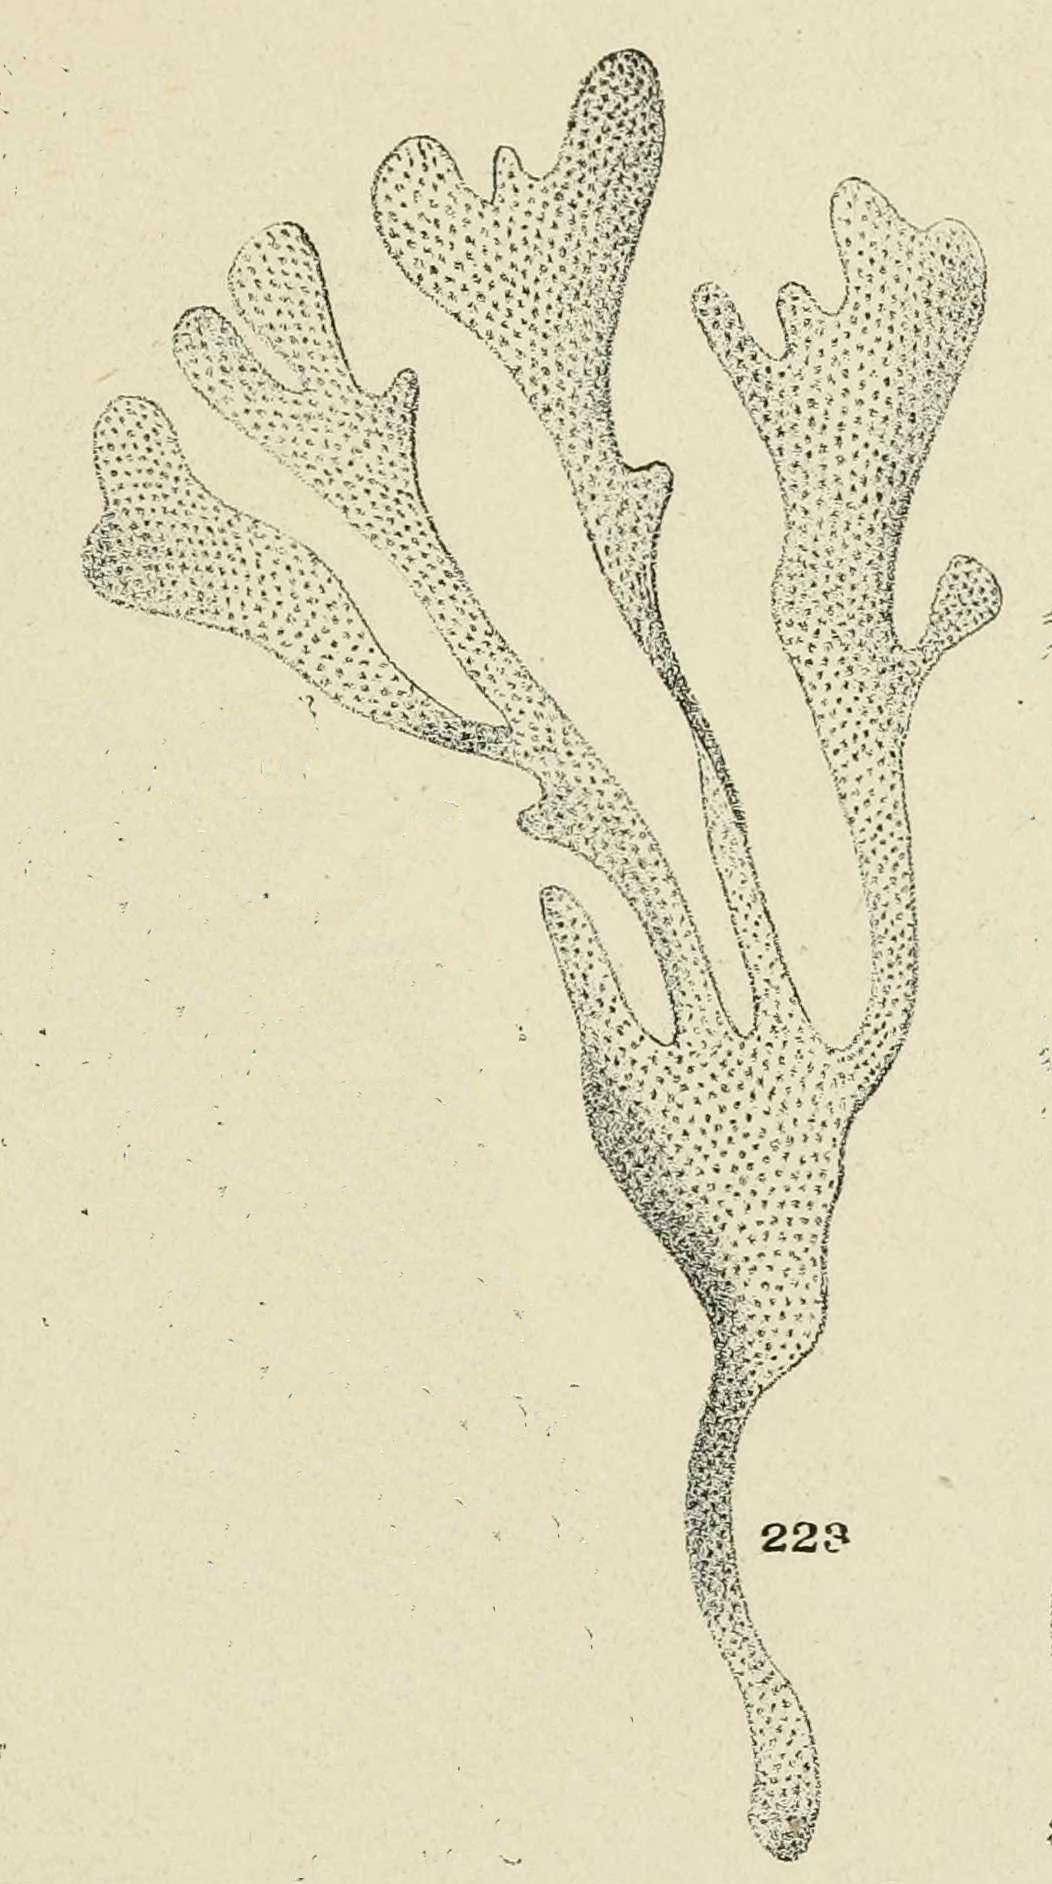 Gravures Coquillages Gravure De Coquillage Flustre Bryozoaires Gravures Illustrations Dessins Images En 2019 Dessin Coquillage Et Illustration